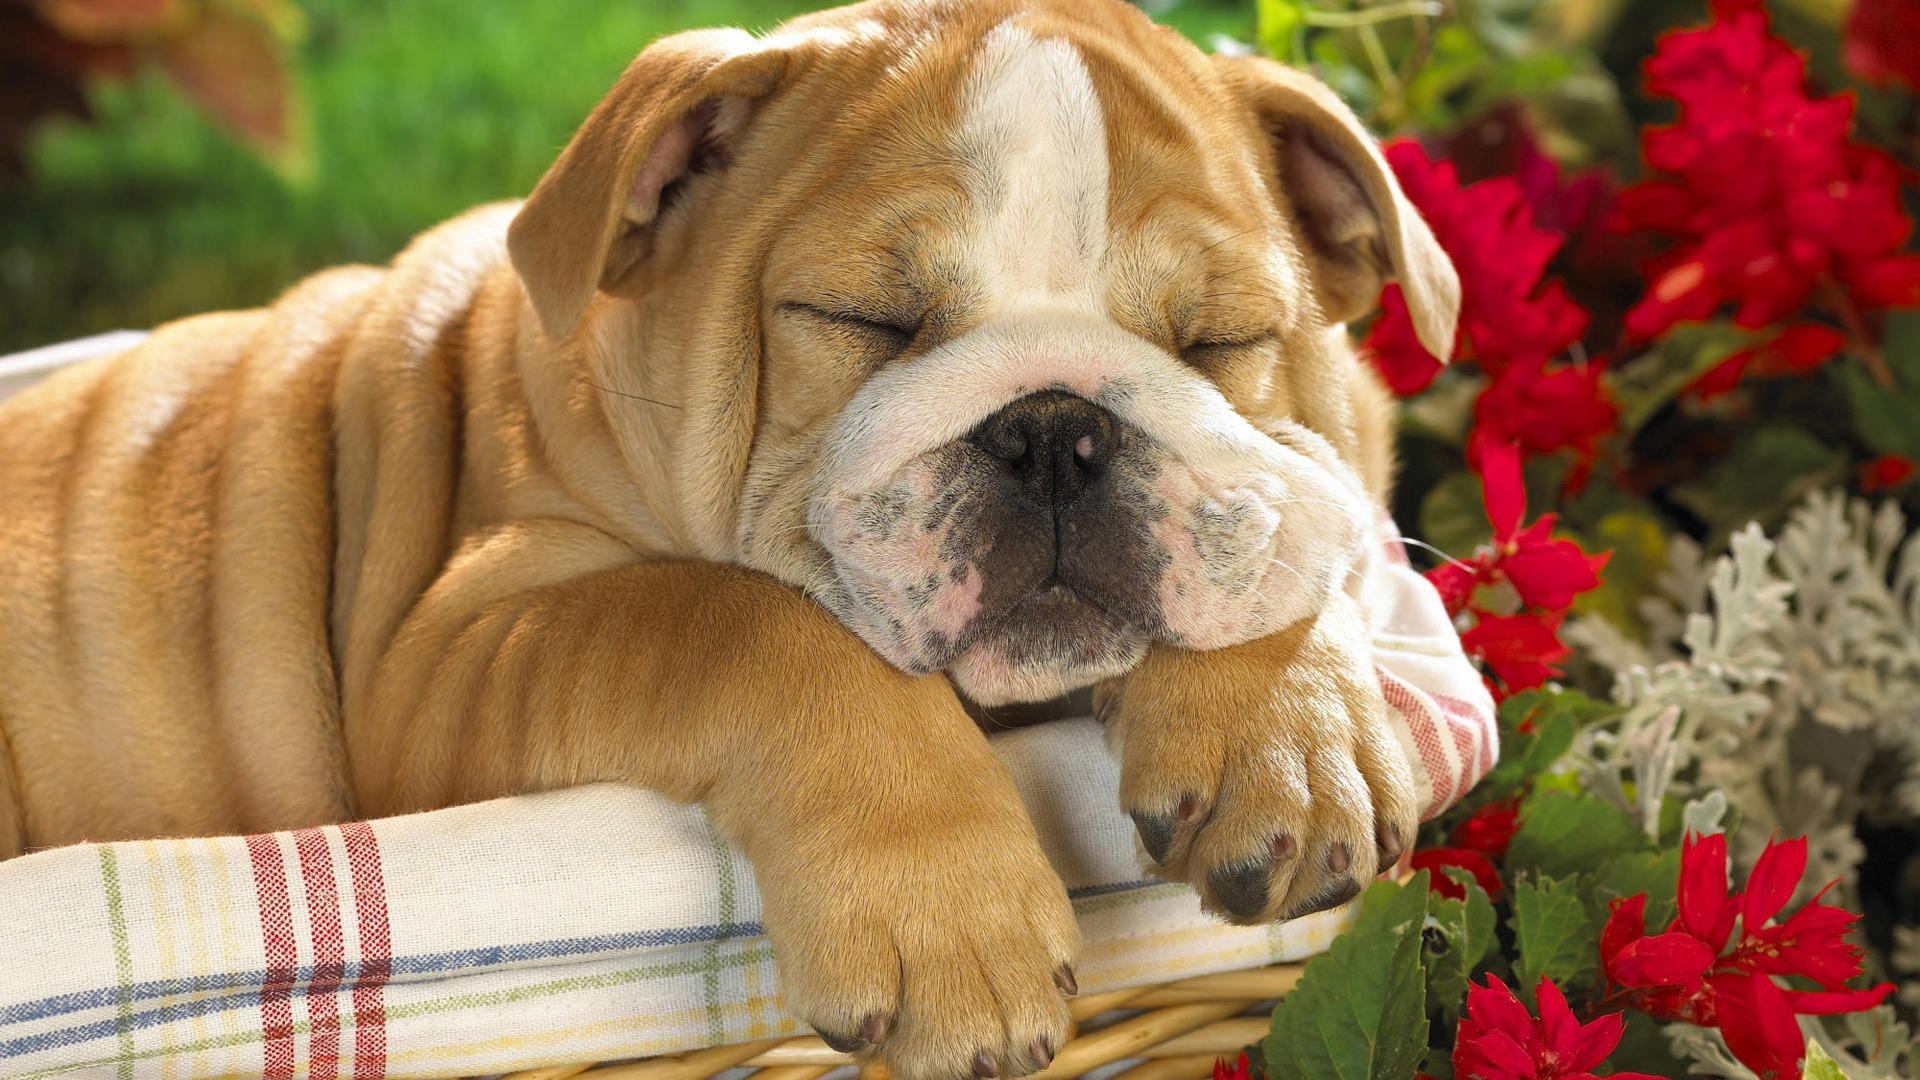 48] Cute Puppy Wallpaper HD on WallpaperSafari 1920x1080